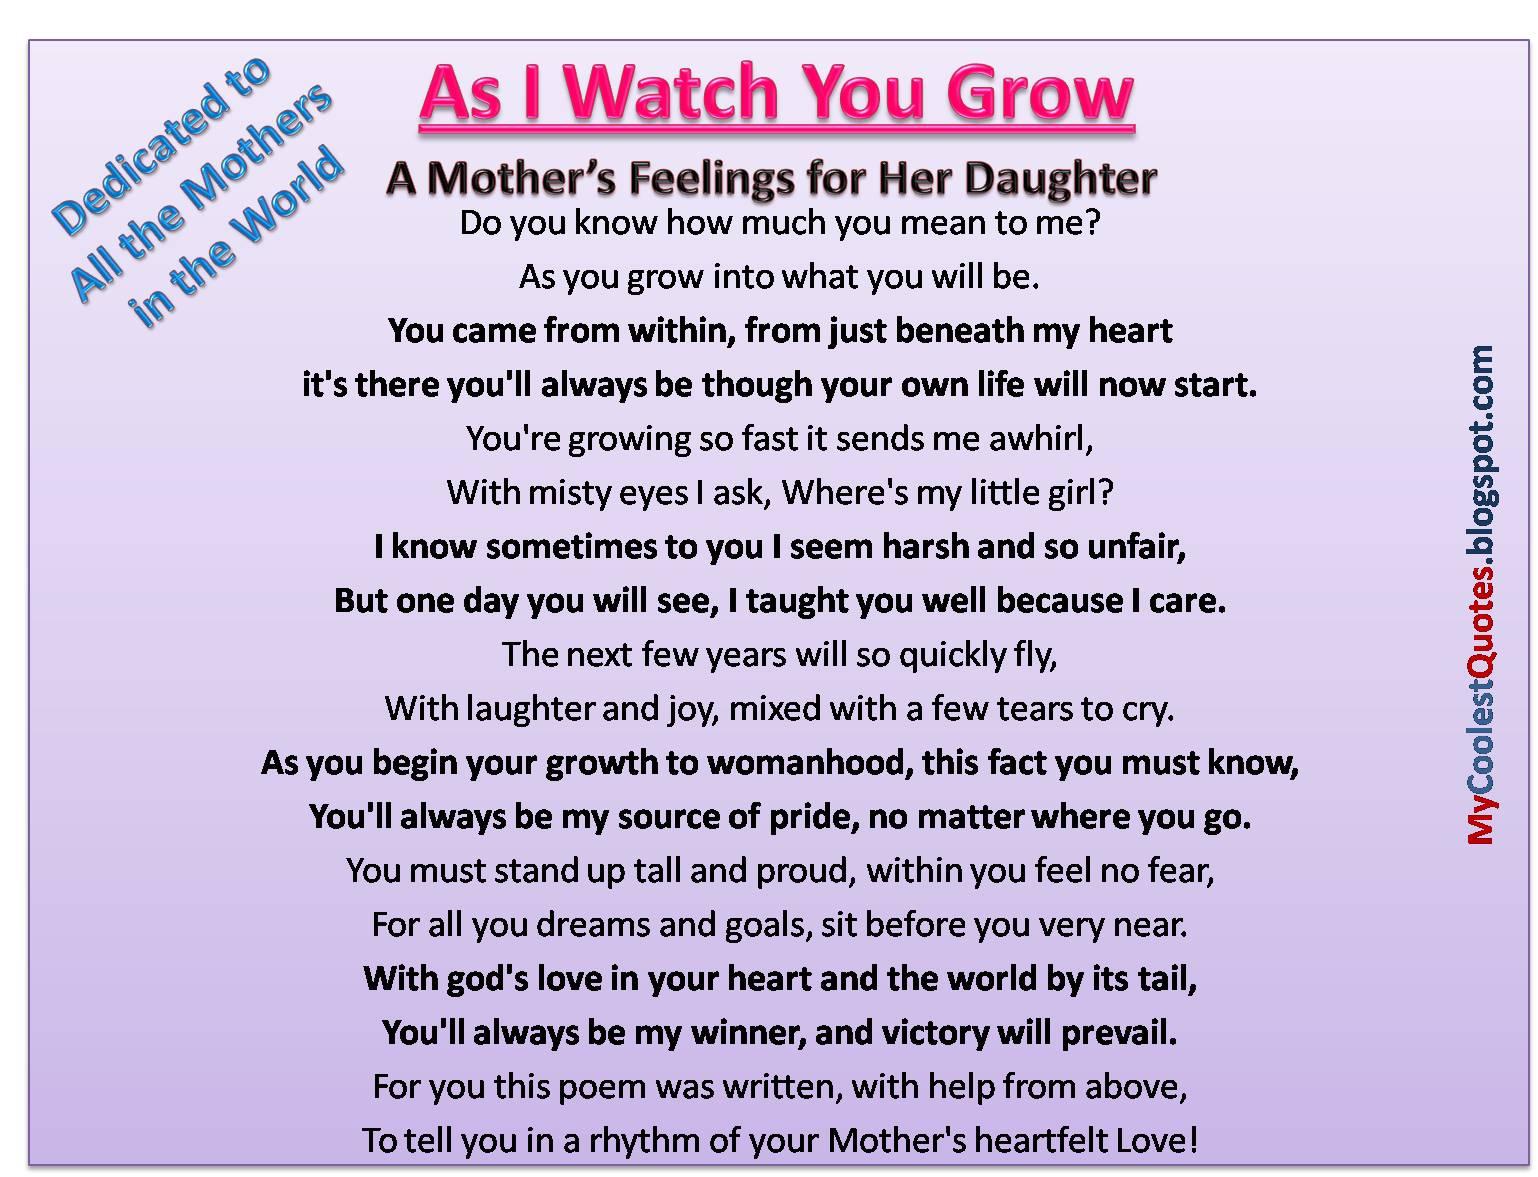 011 Mothersloveforherdaughter Mothers Love Essay Phenomenal Wikipedia In Tamil On Gujarati Full